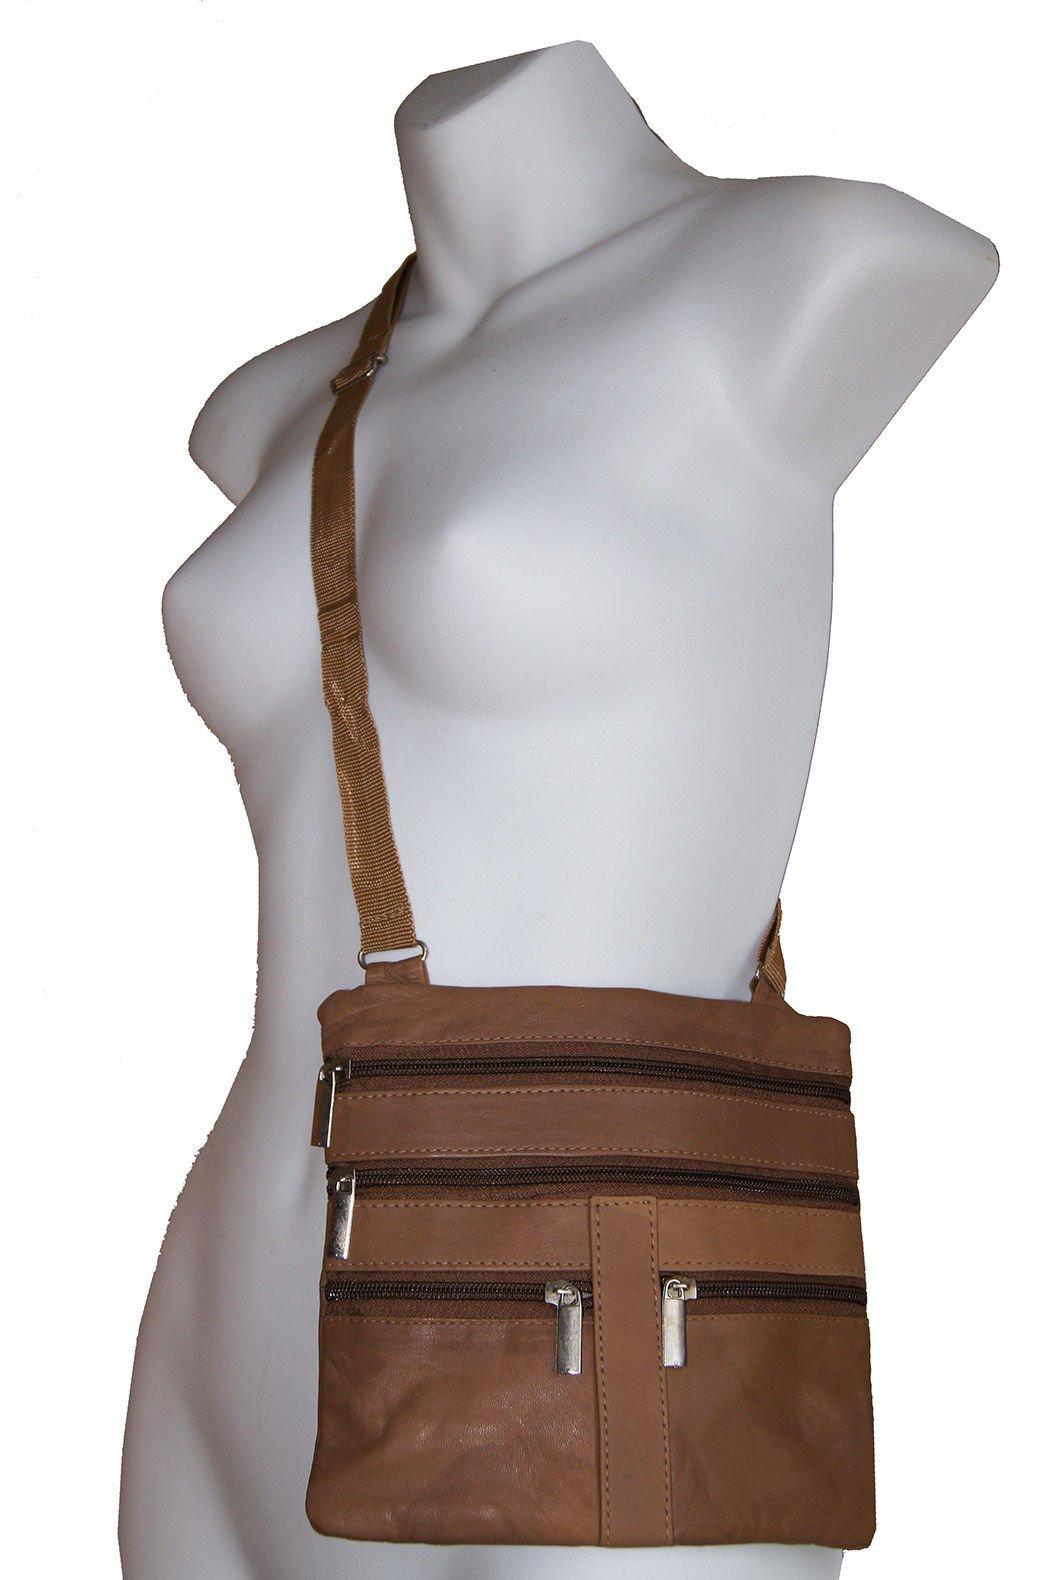 Tan Ladies Genuine Leather Cross Body Bag Satchel Messenger Bag 48'' Strap